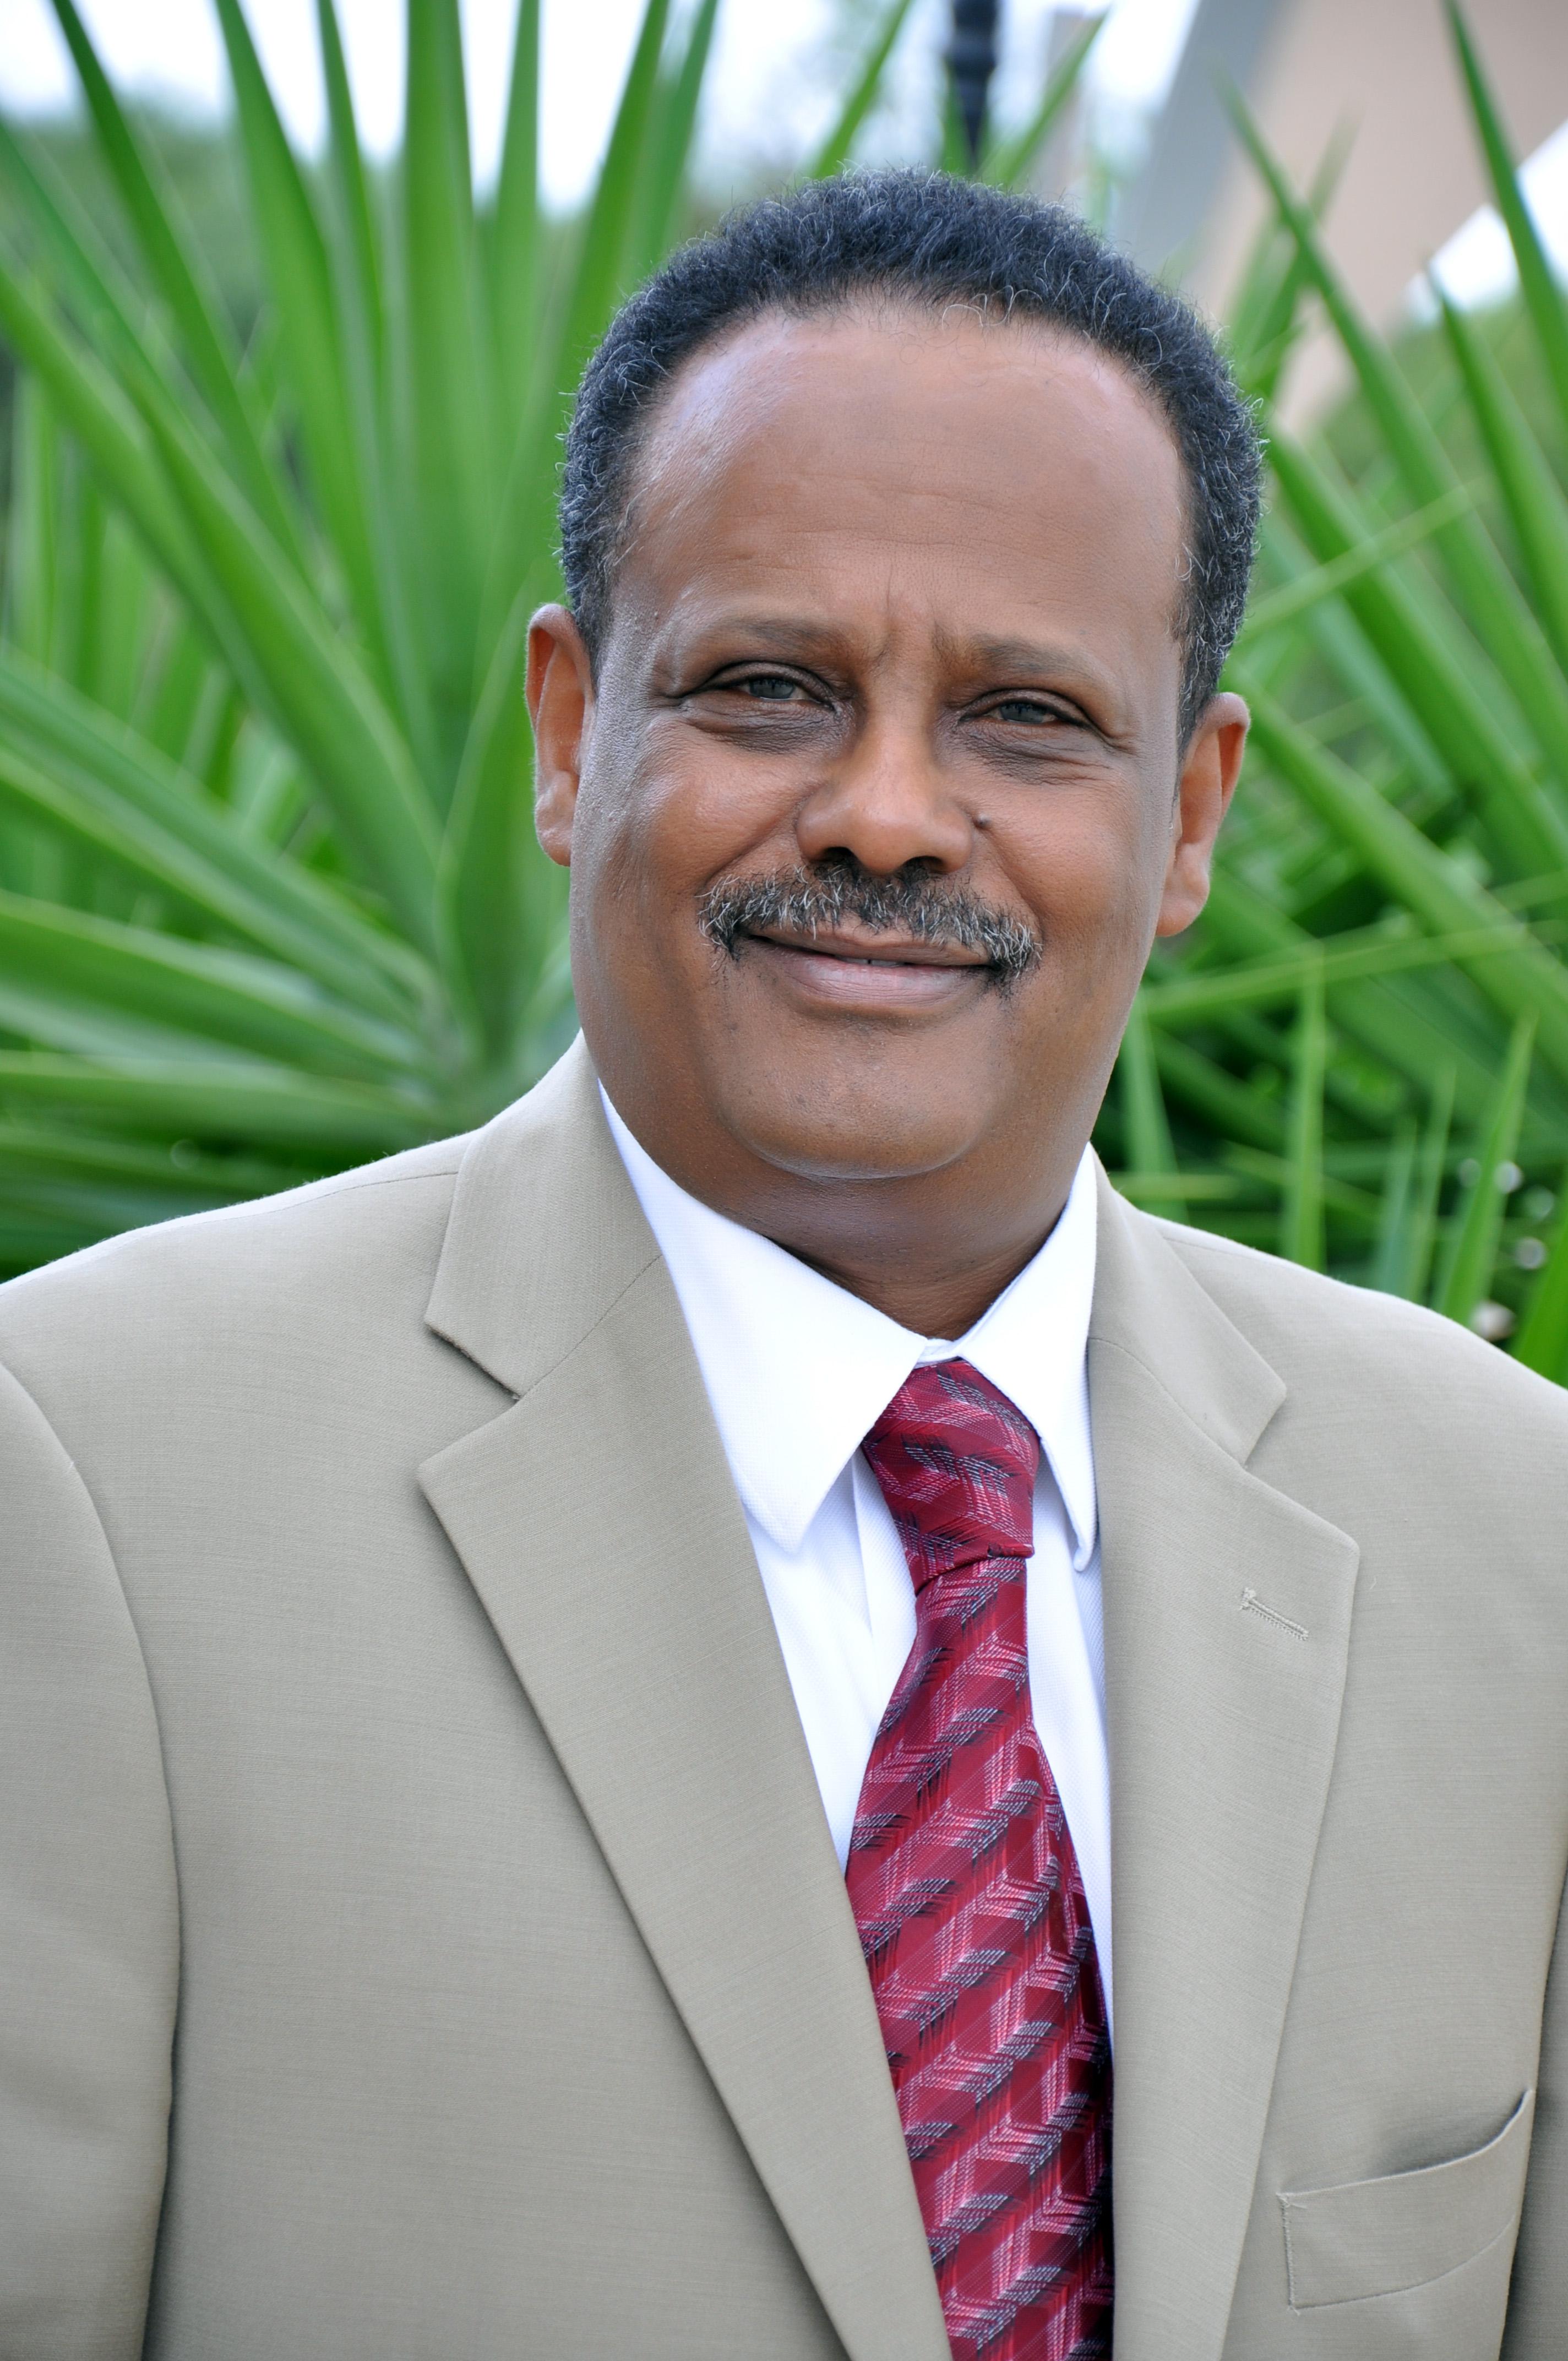 Tewodros Melesse (image: IPPF)